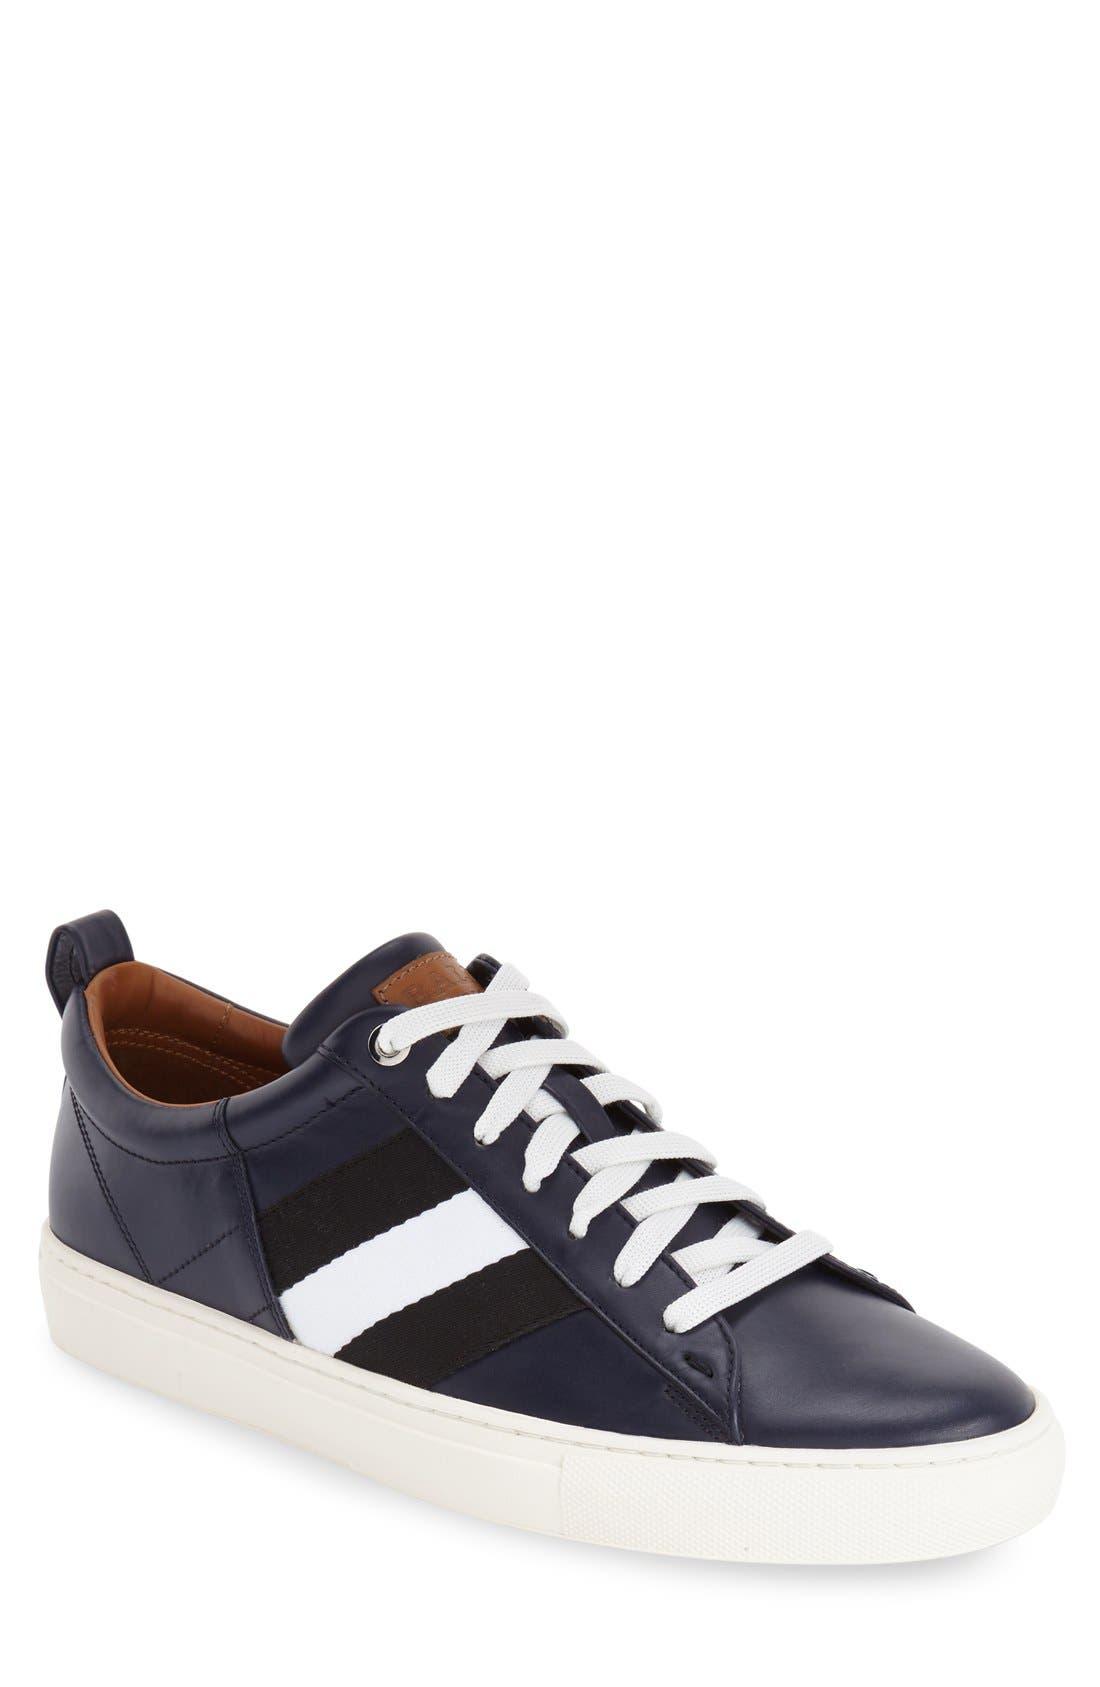 'Helvio' Sneaker,                             Main thumbnail 1, color,